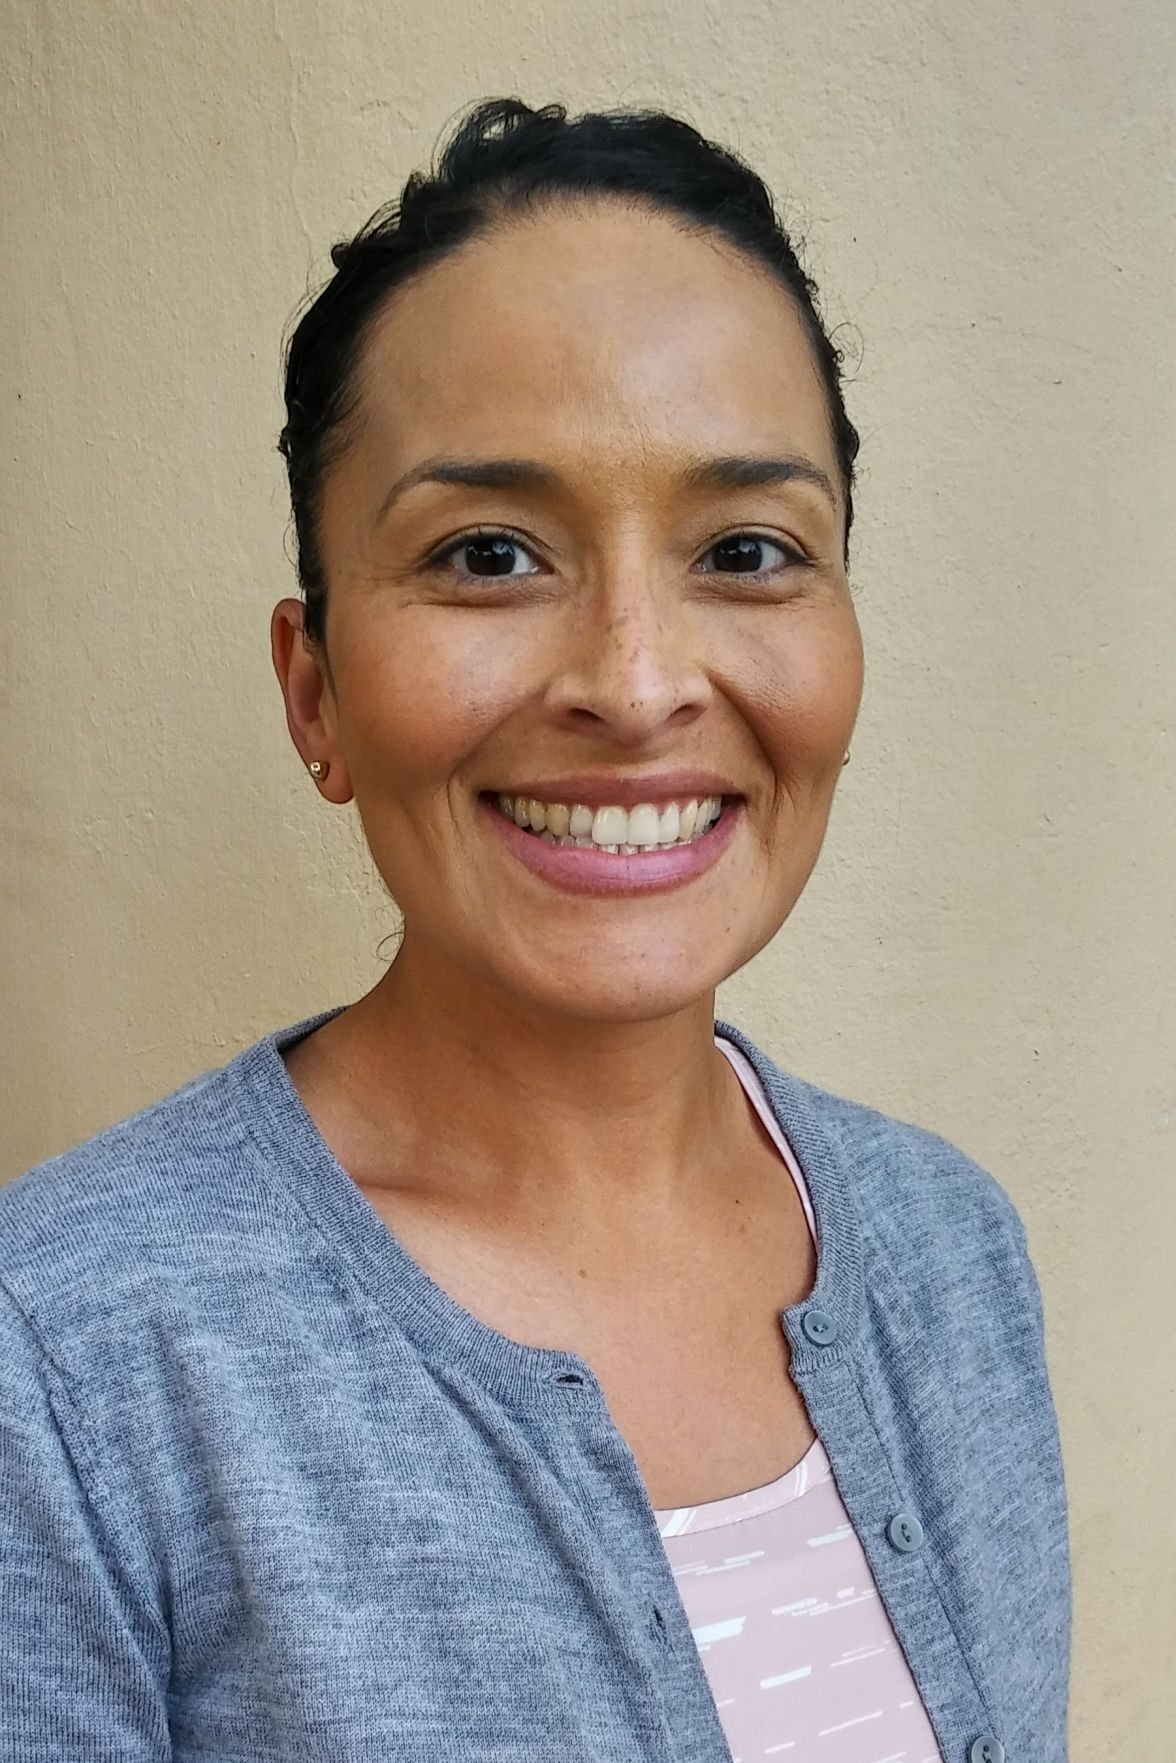 Kingsburg: Sara Luquin